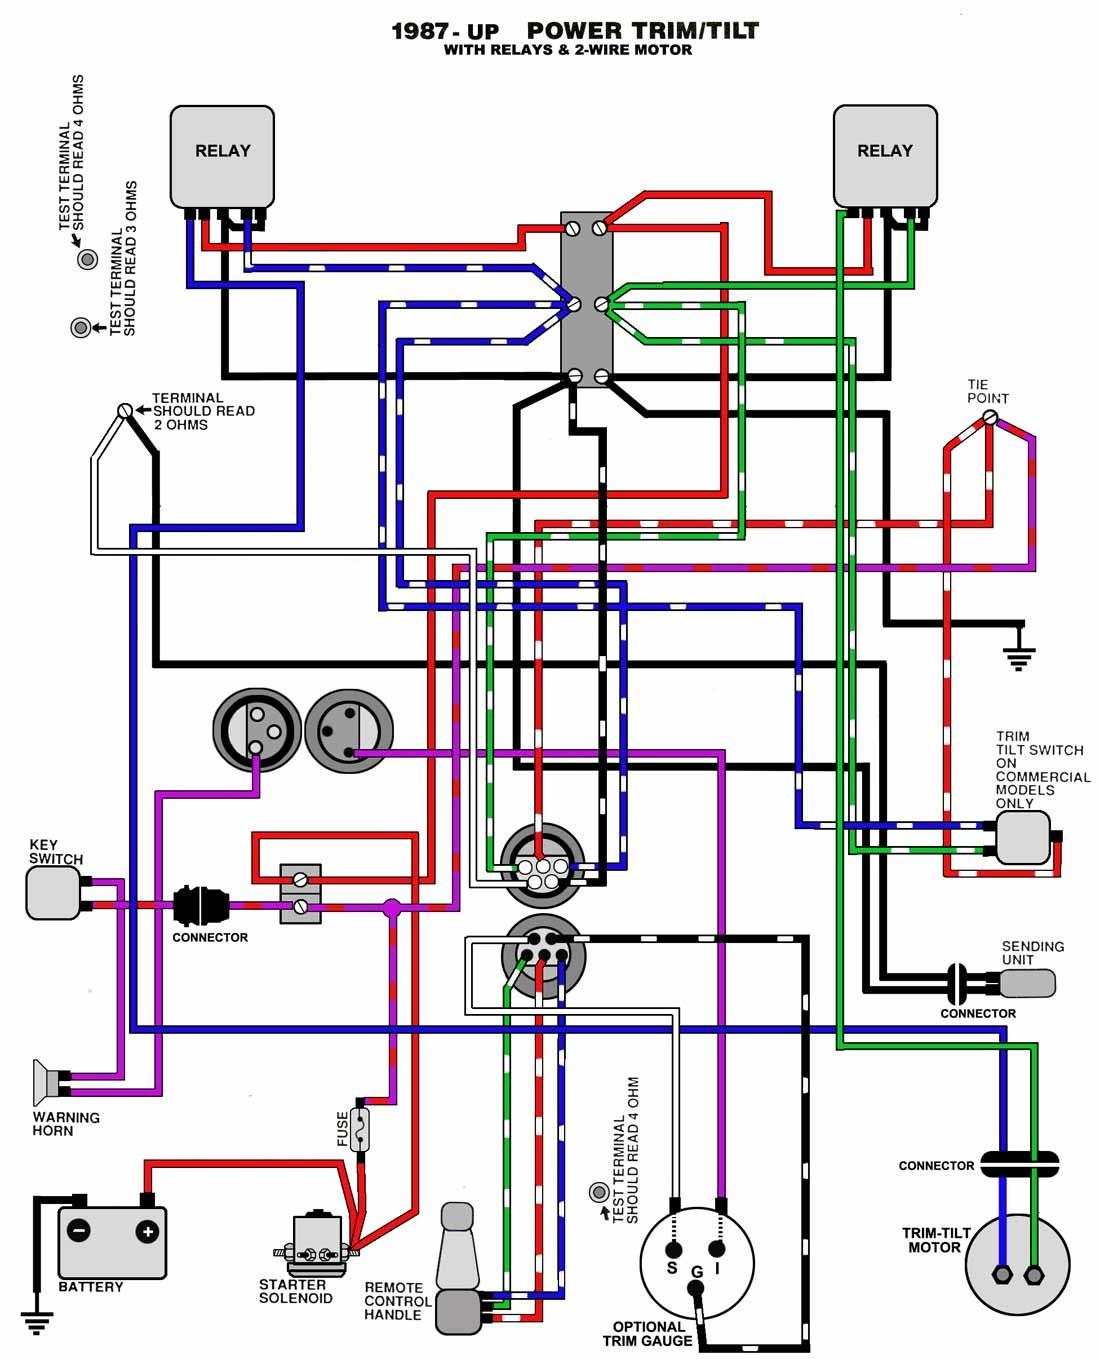 hight resolution of 1987 mercury outboard motor wiring diagram wiring center u2022 rh 45 63 64